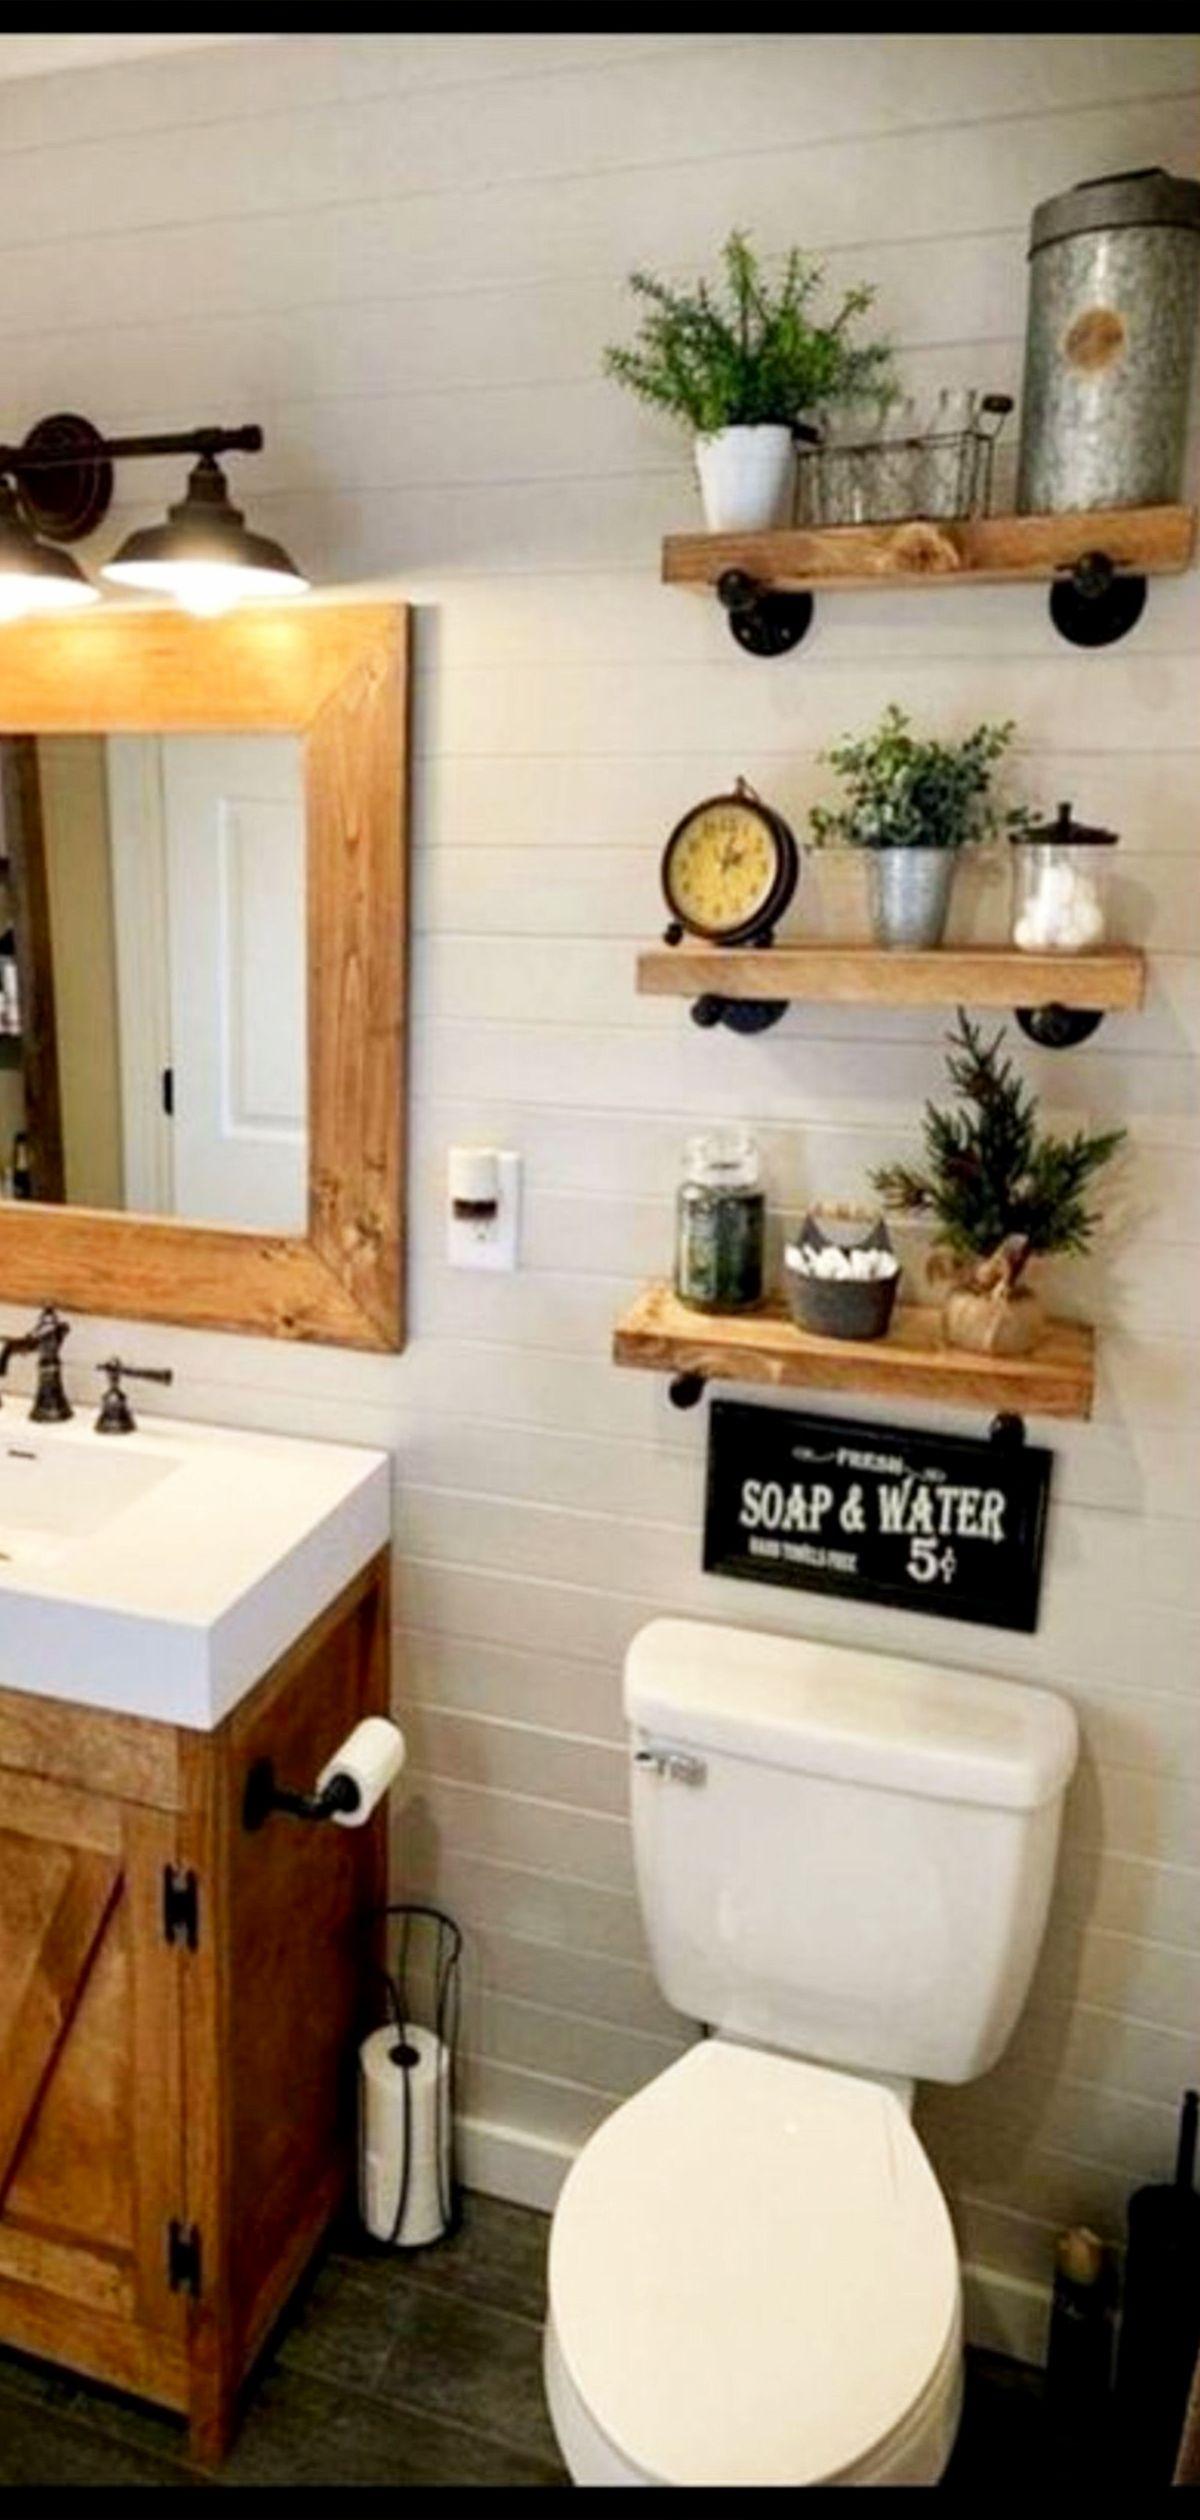 Country Outhouse Bathroom Decorating Ideas Outhouse Bathroom Decor In 2020 Bathroom Decor Outhouse Bathroom Decor Decor